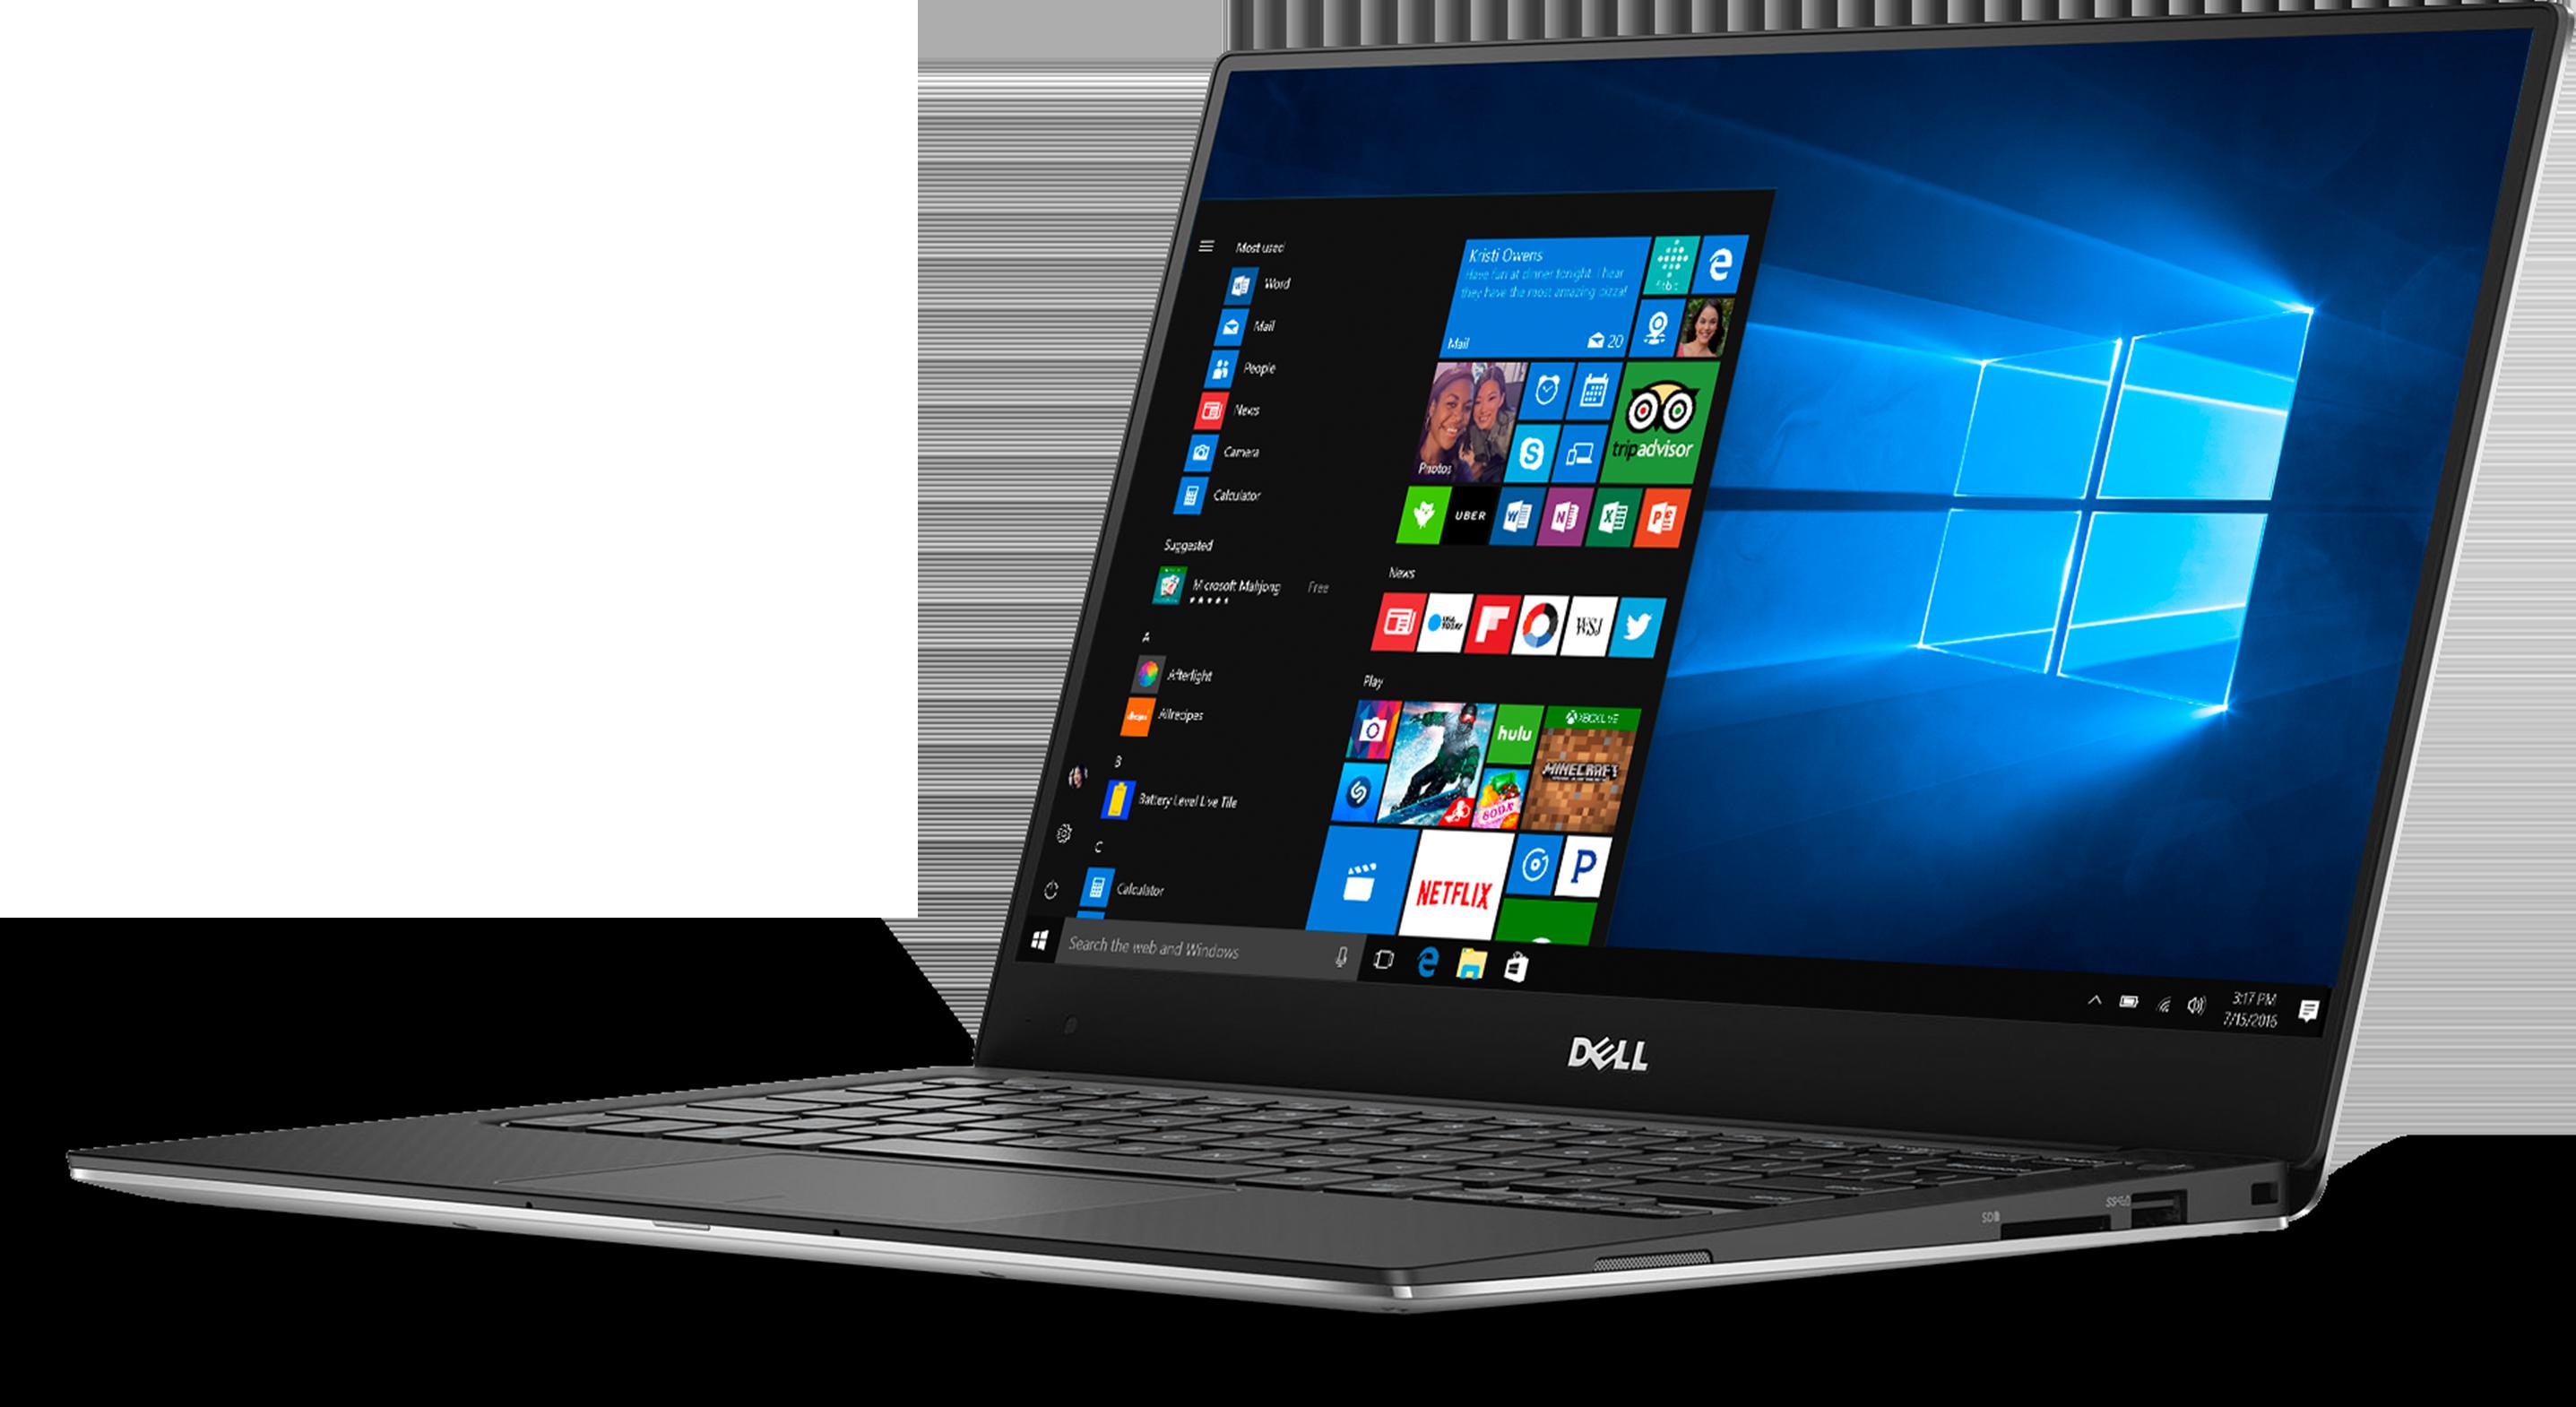 Dell XPS 13 9360 Signature Edition Laptop Deal